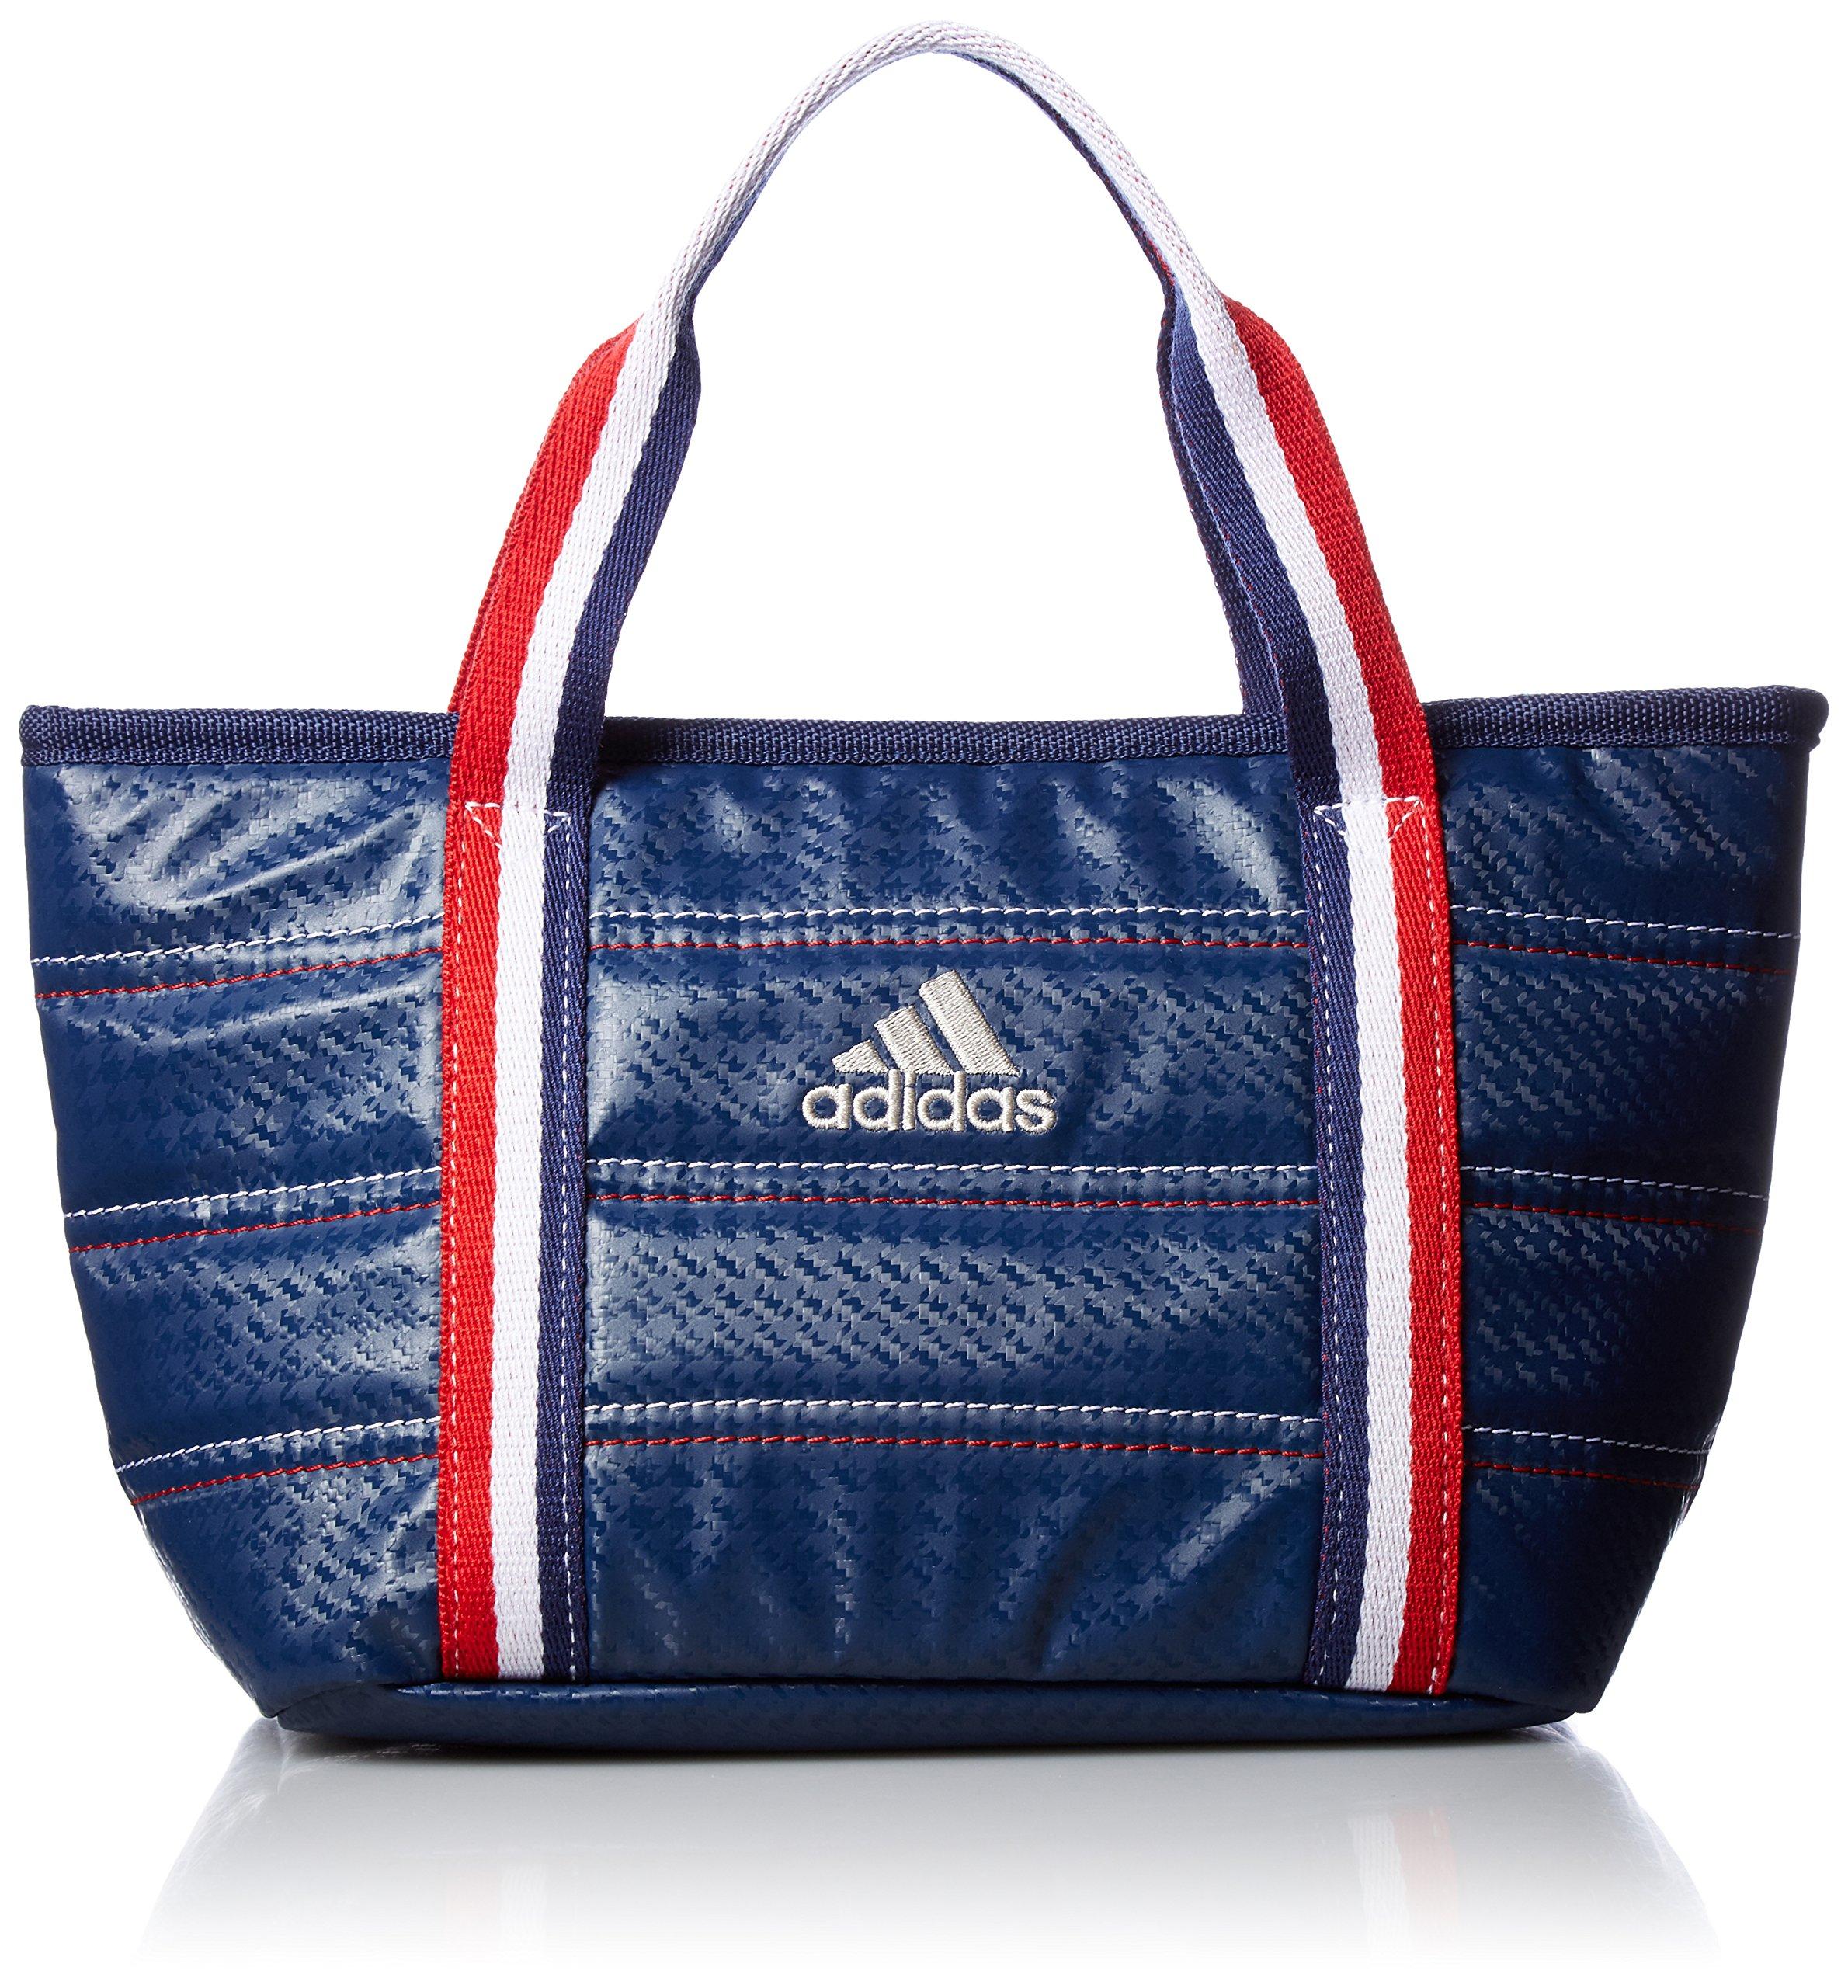 [Adidas Golf] round tote bag L23 × W18 × H13cm AWT 28 A42073 navy